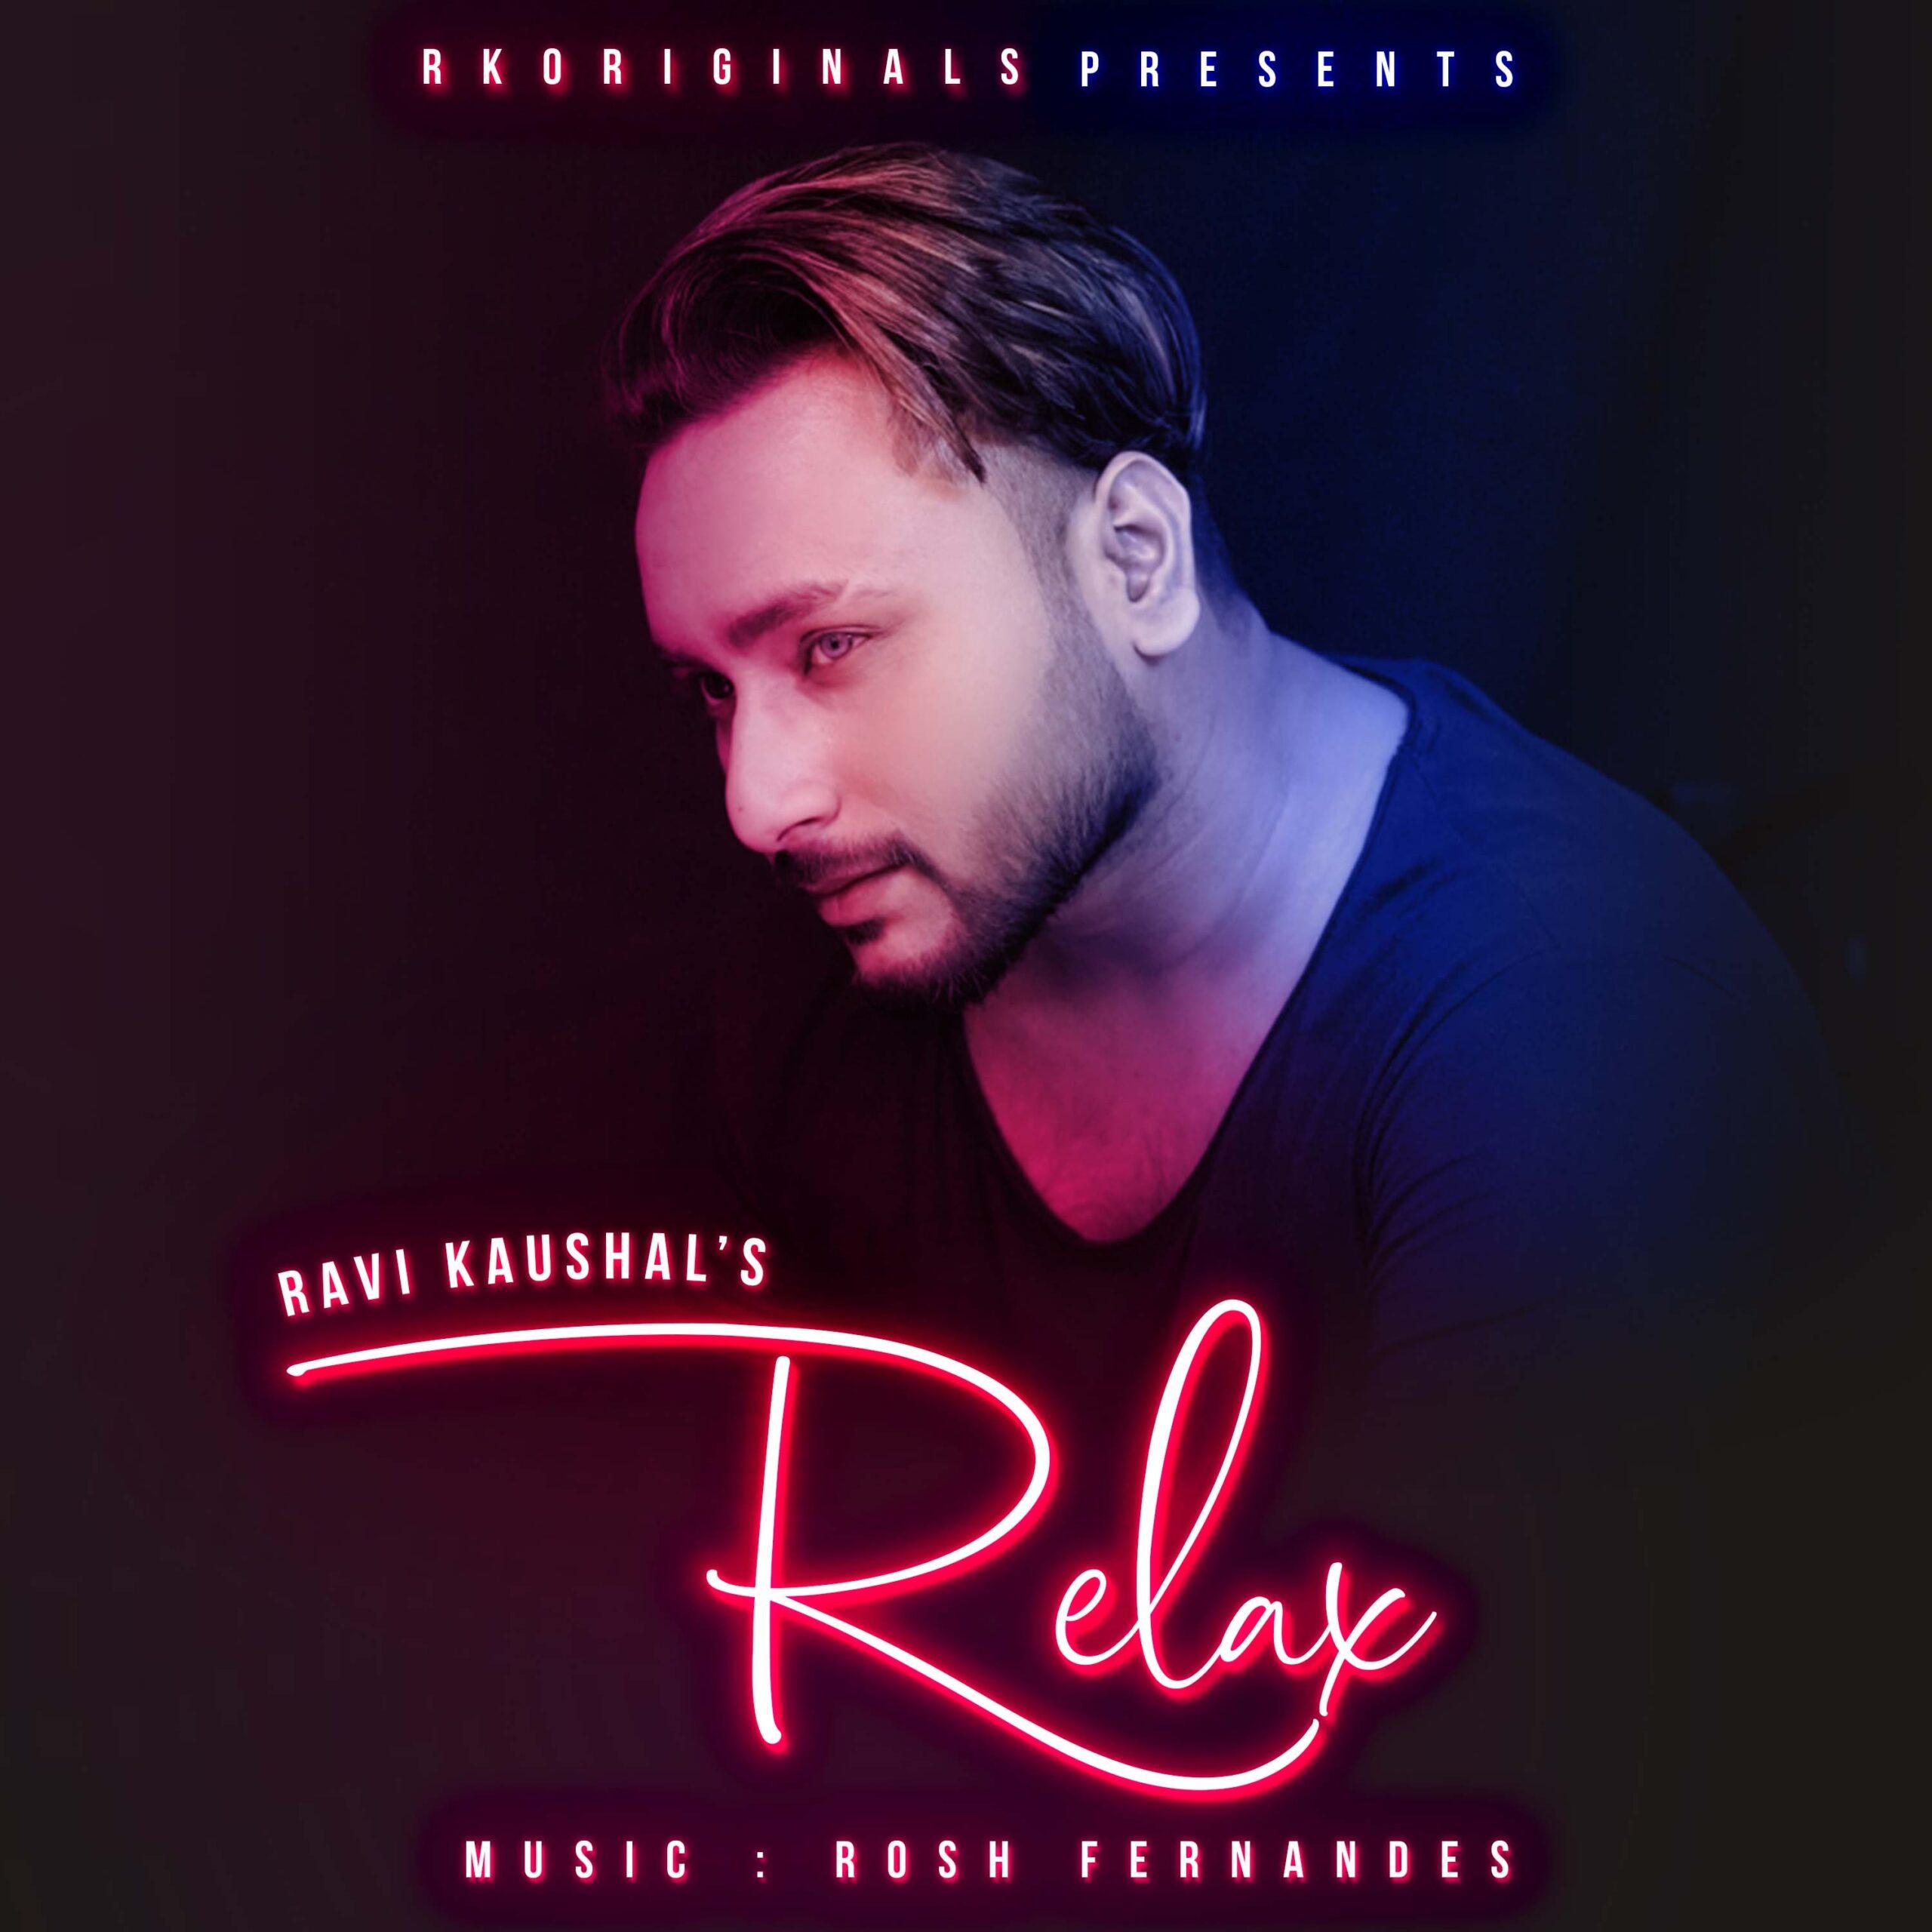 Relax - Ravi Kaushal